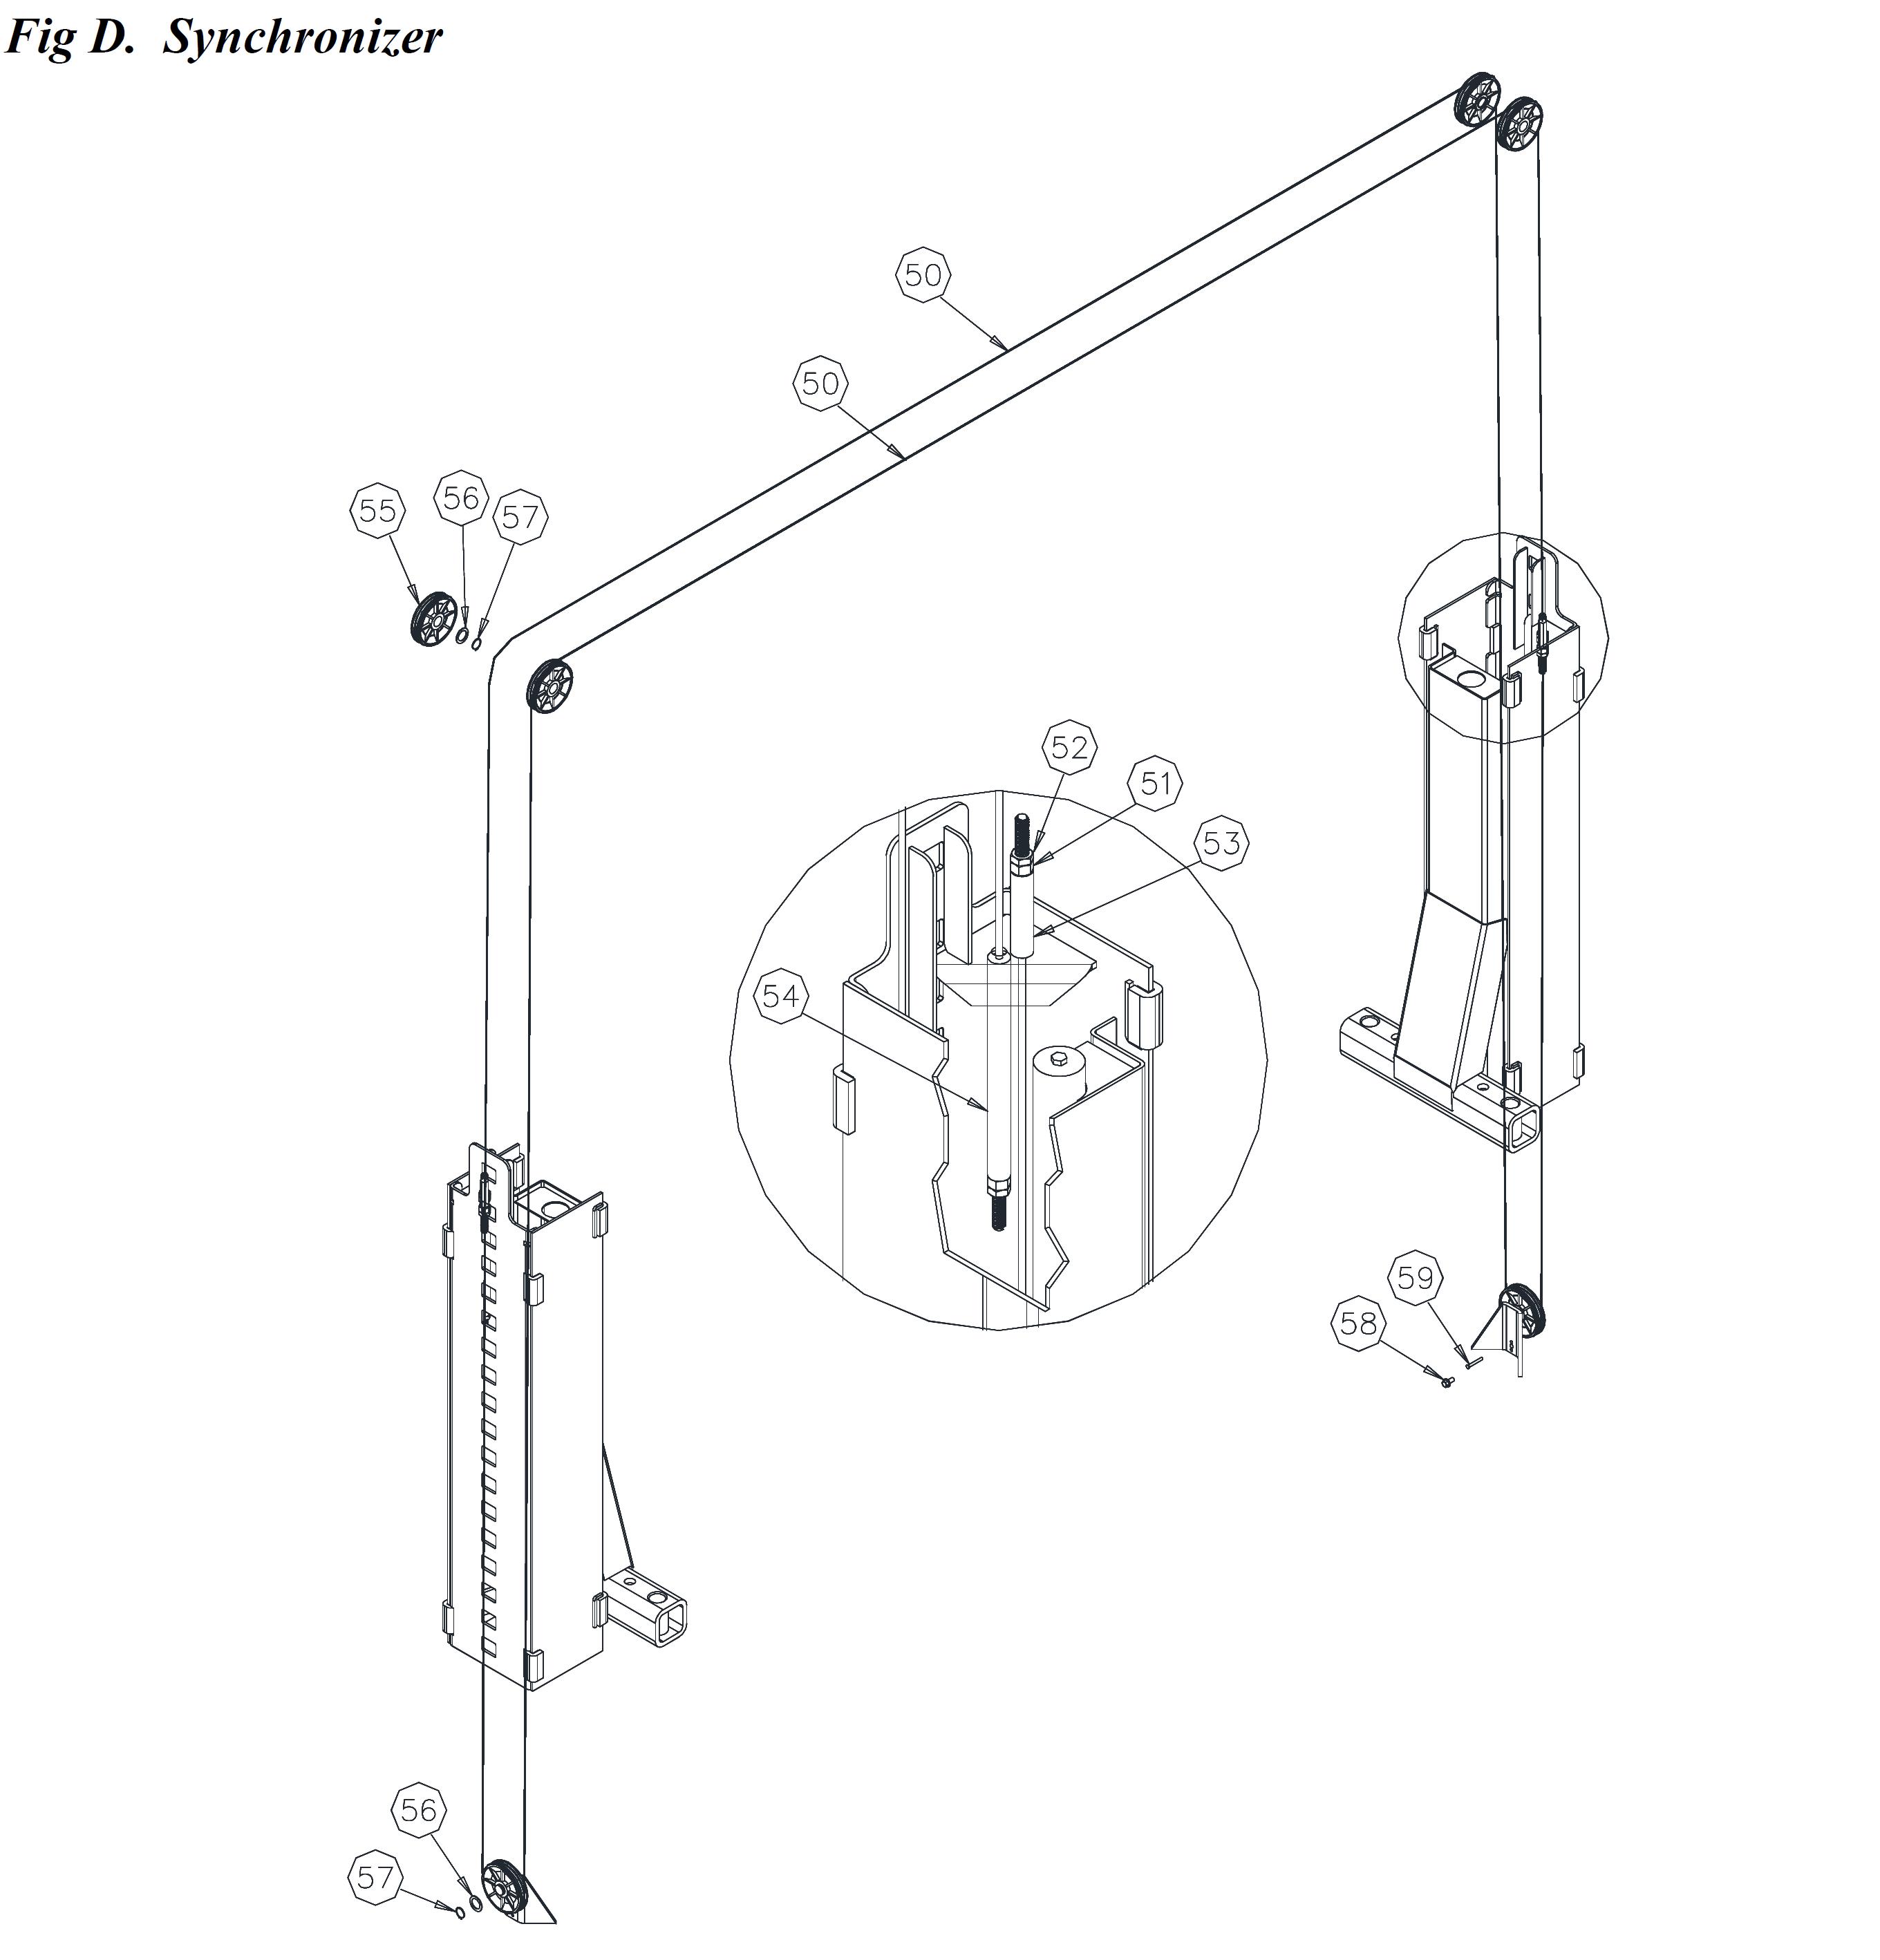 cl10-synchronizer-diagram-ii.png